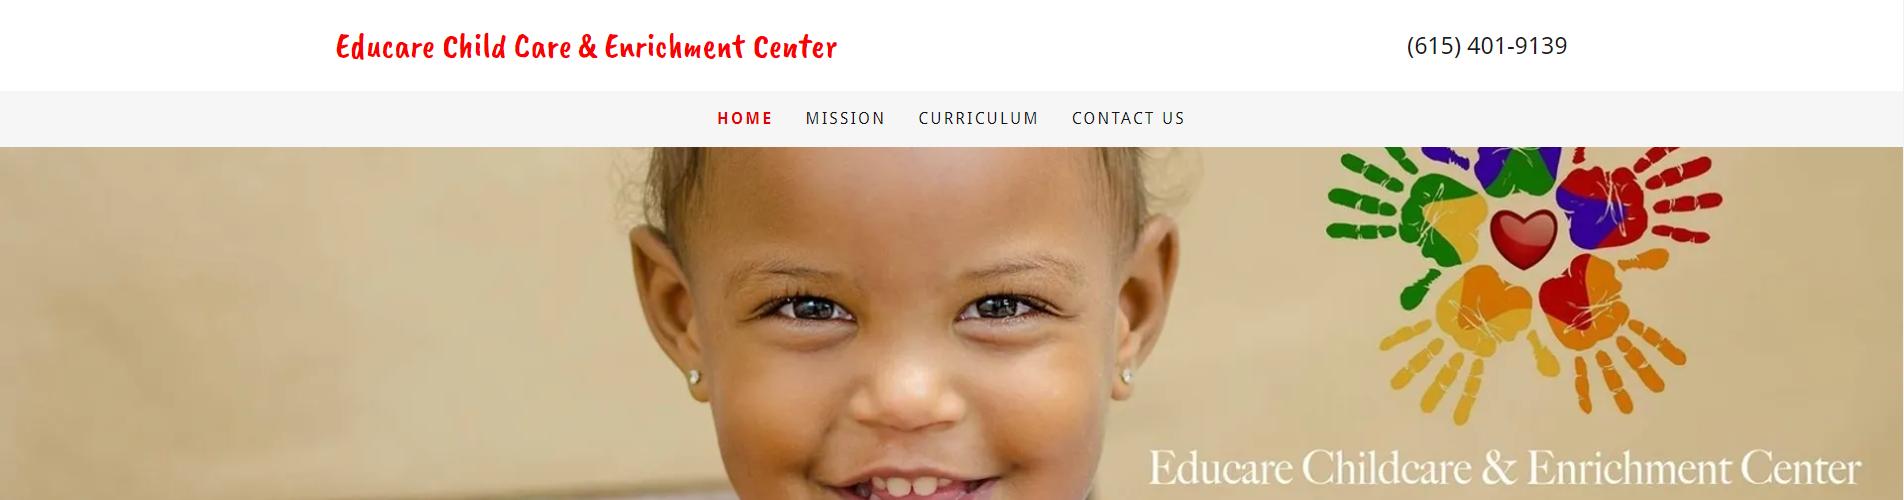 Comprehensive Child Care Centers in Nashville